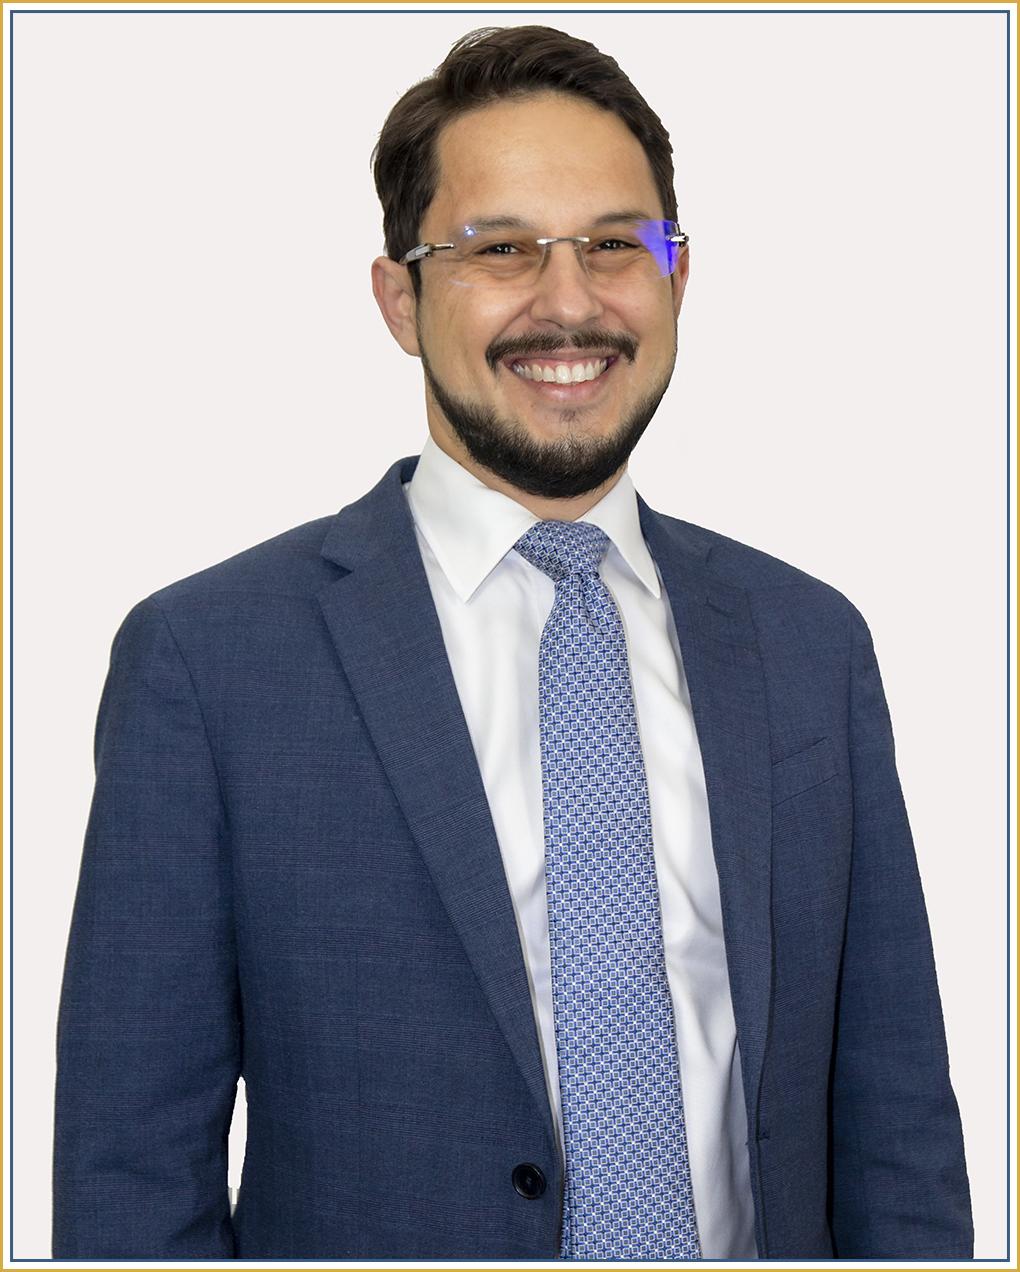 Pedro-Giglio-Ortopedista-Joelho-1